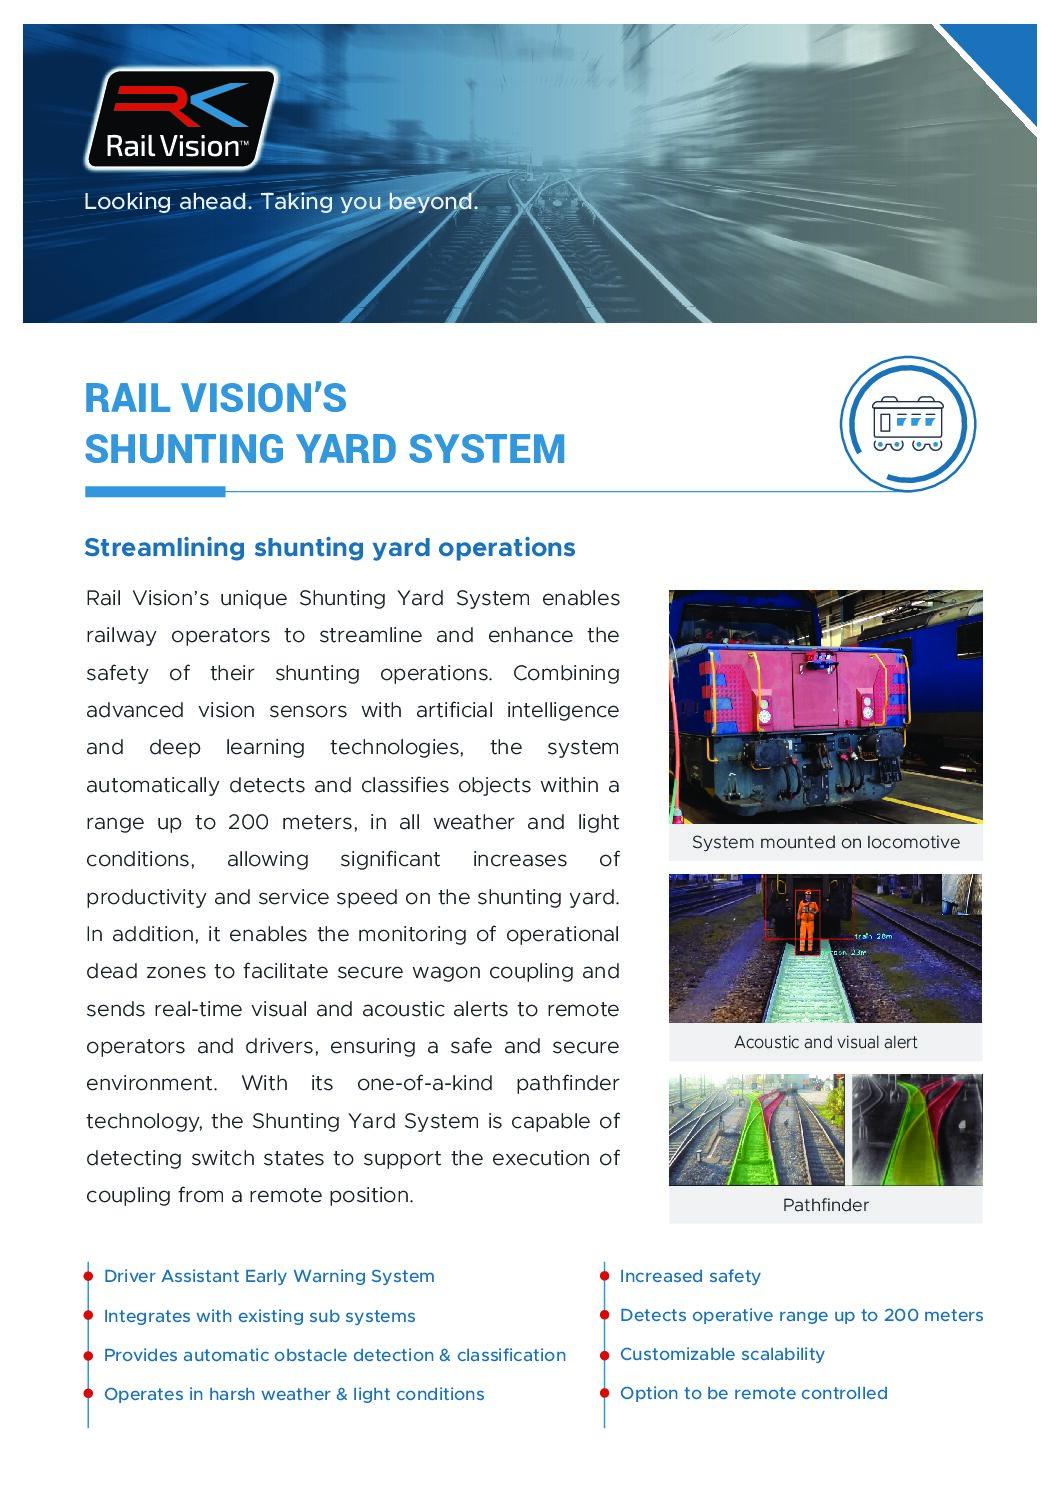 Rail Vision Shunting Yard Fact Sheet